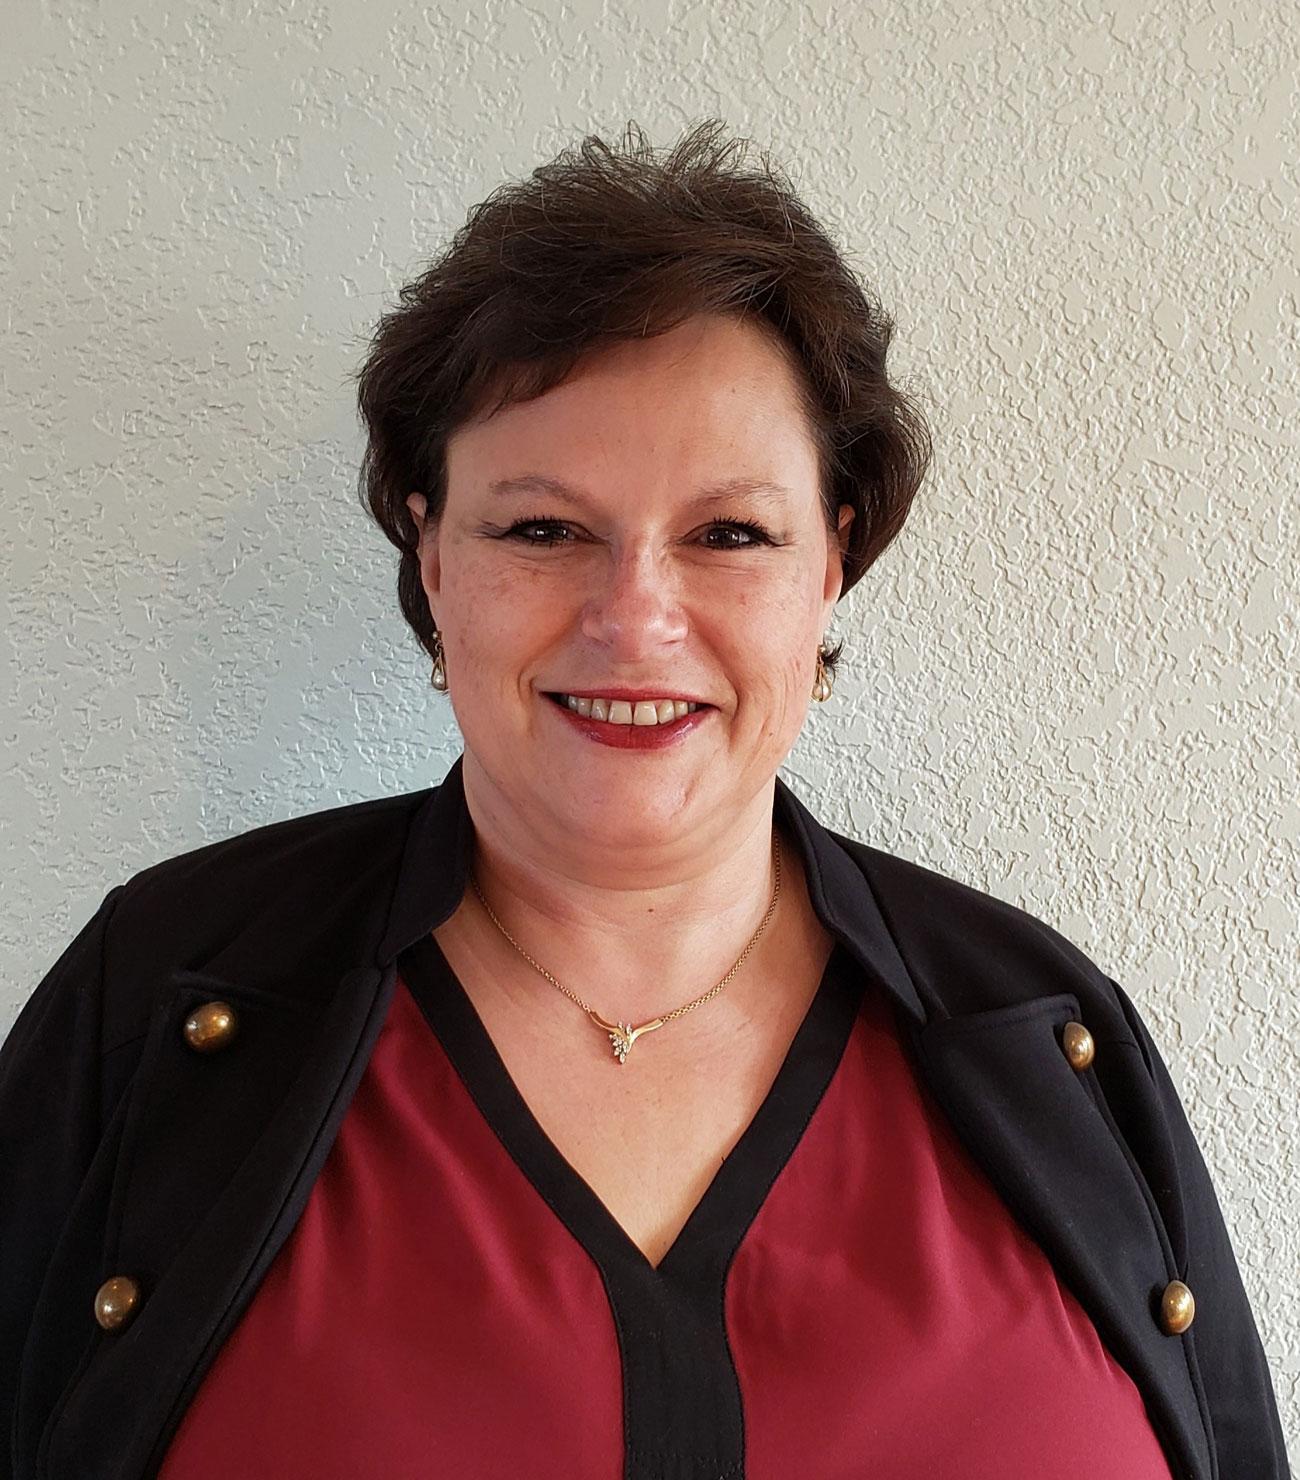 Veena Halvorson